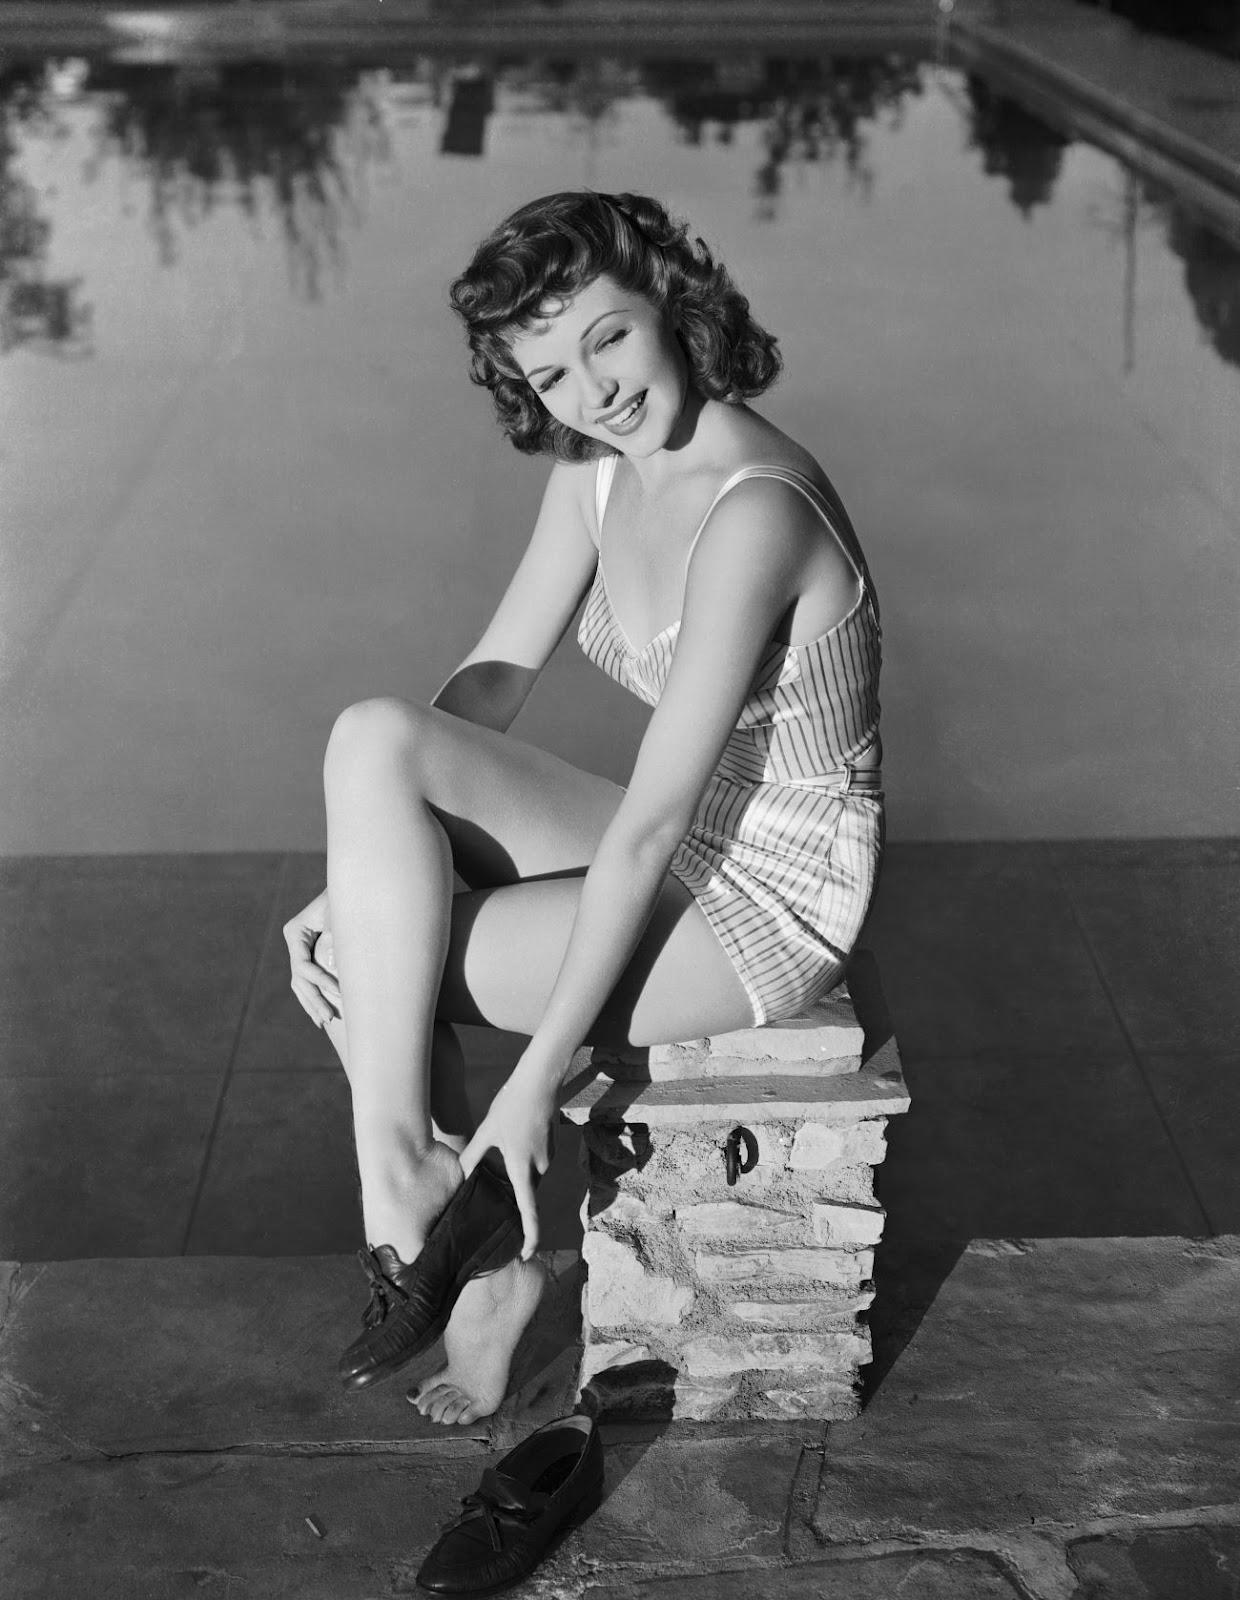 Rita Hayworth's Feet  |Rita Hayworth Feet